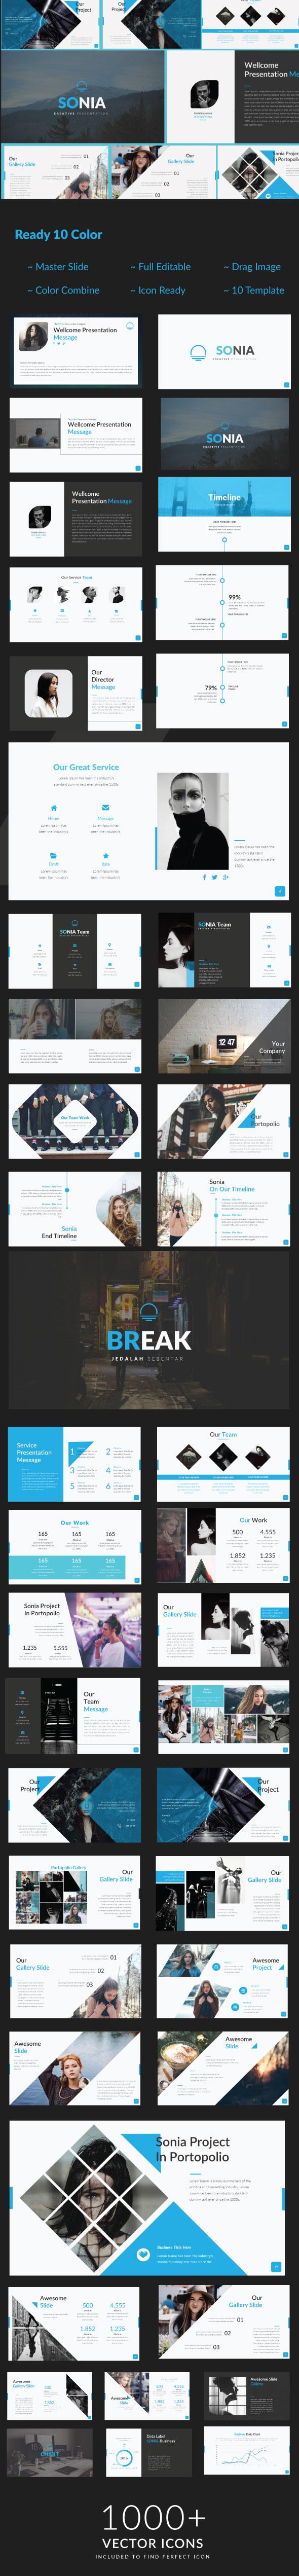 Sonia Creative Presentation - Creative PowerPoint Templates